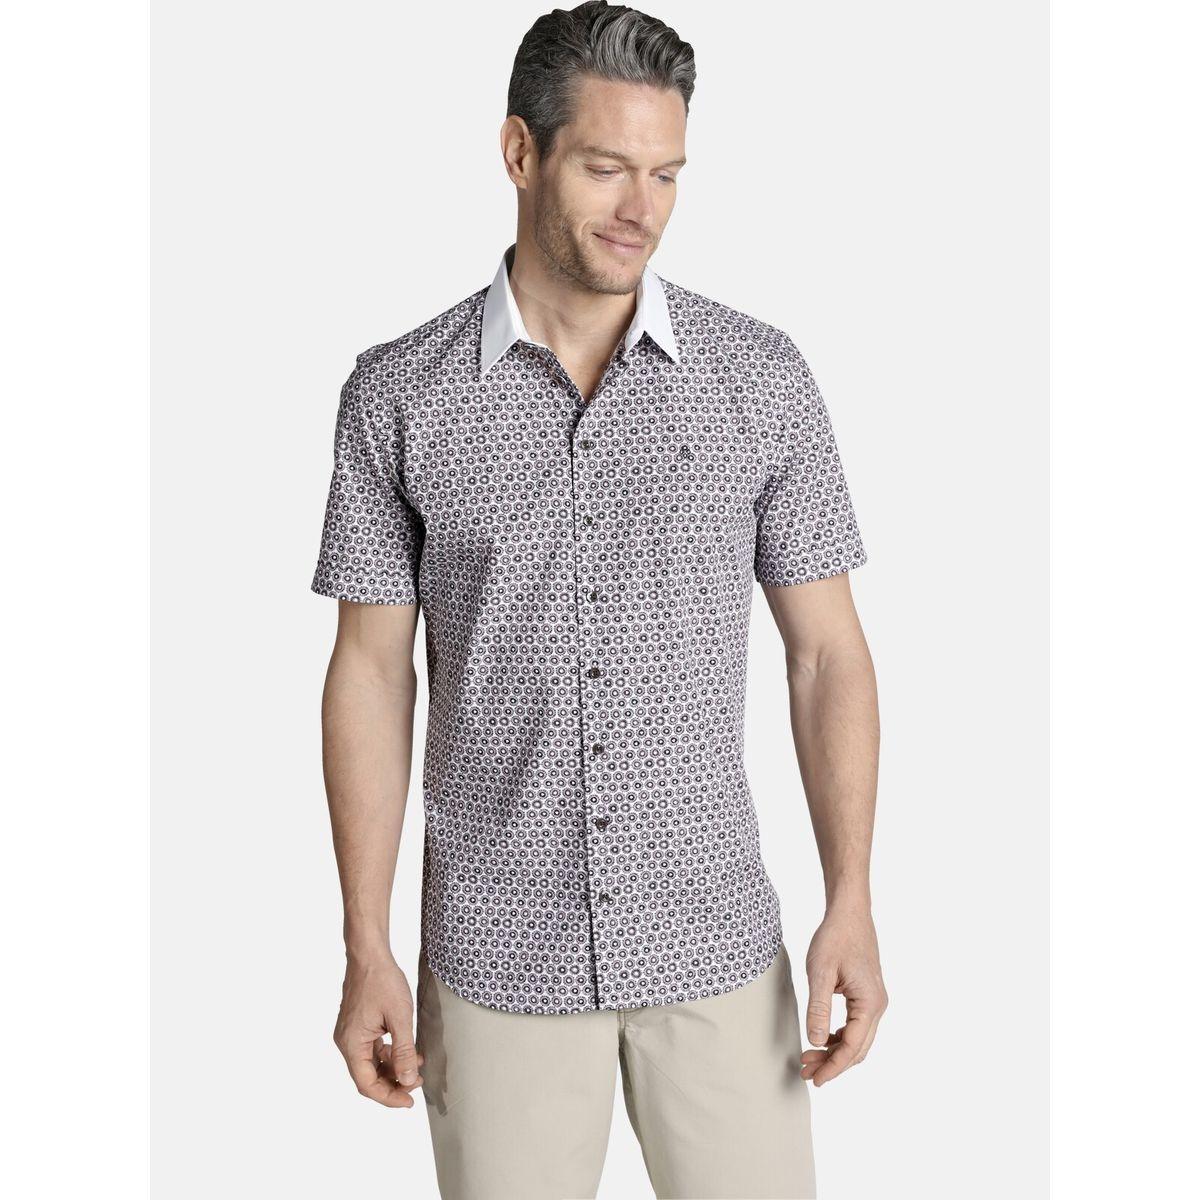 Chemise à manches courtes GAWAIN